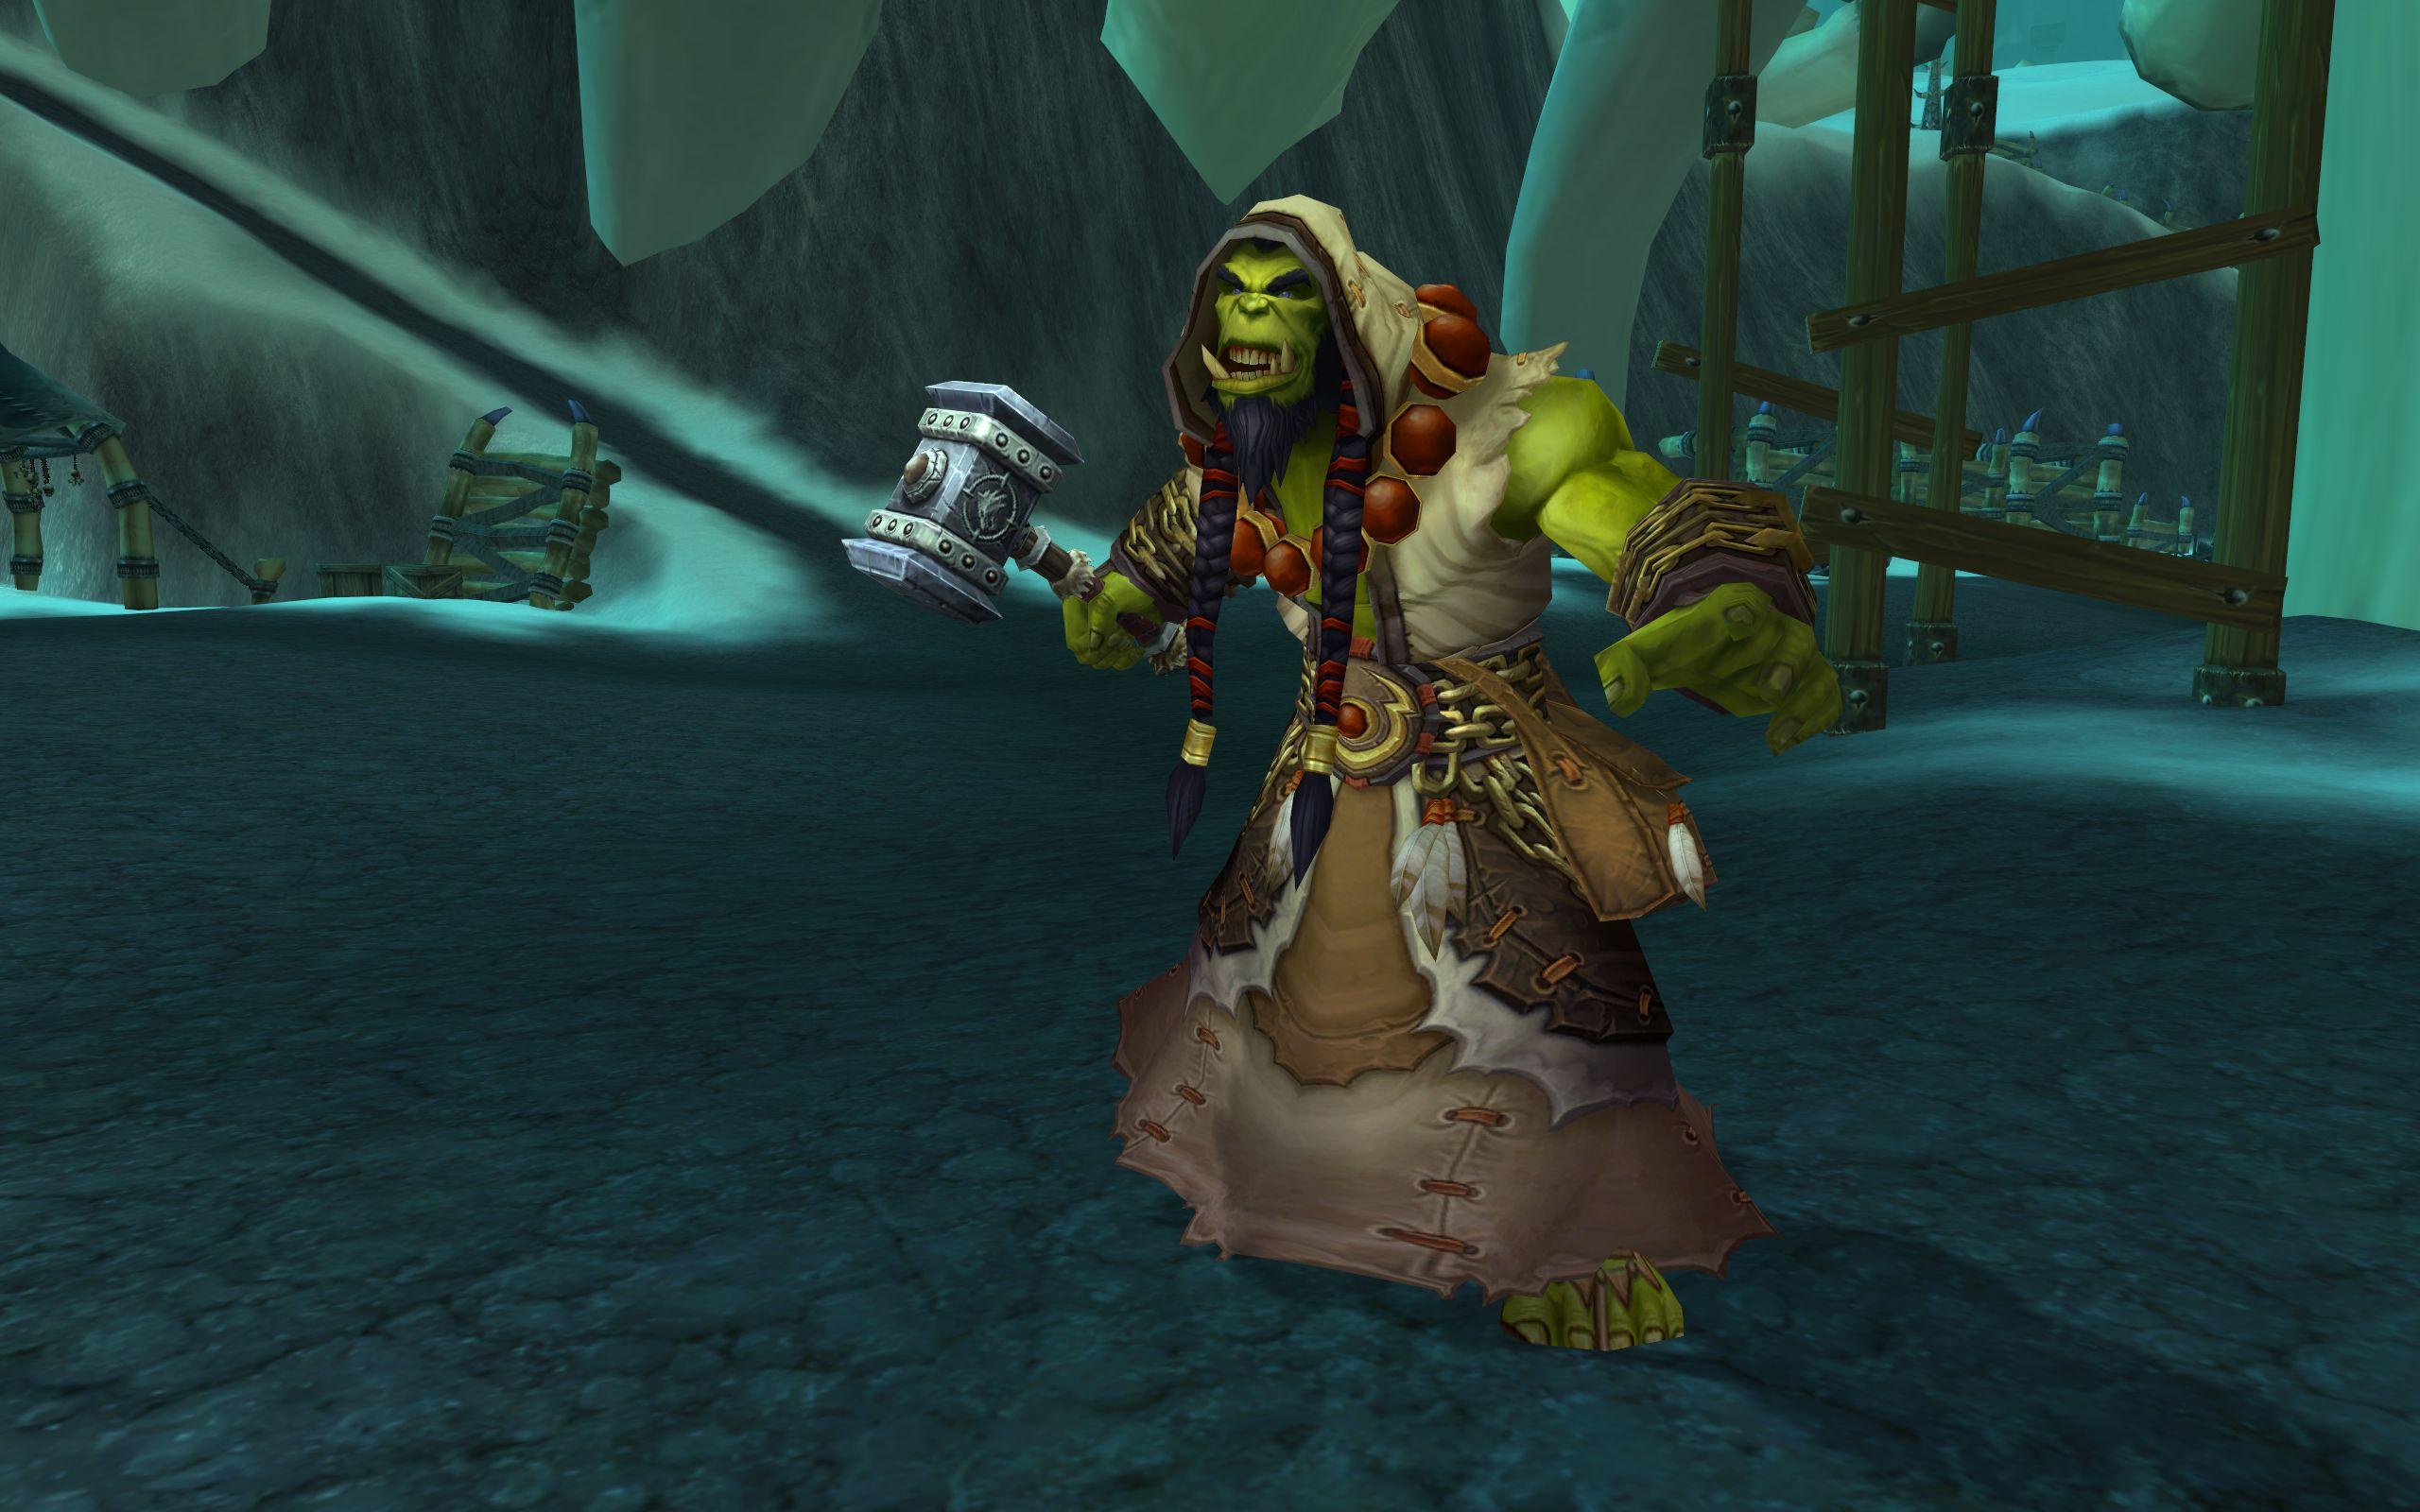 World of warcraft cataclysm orc speach xxx video